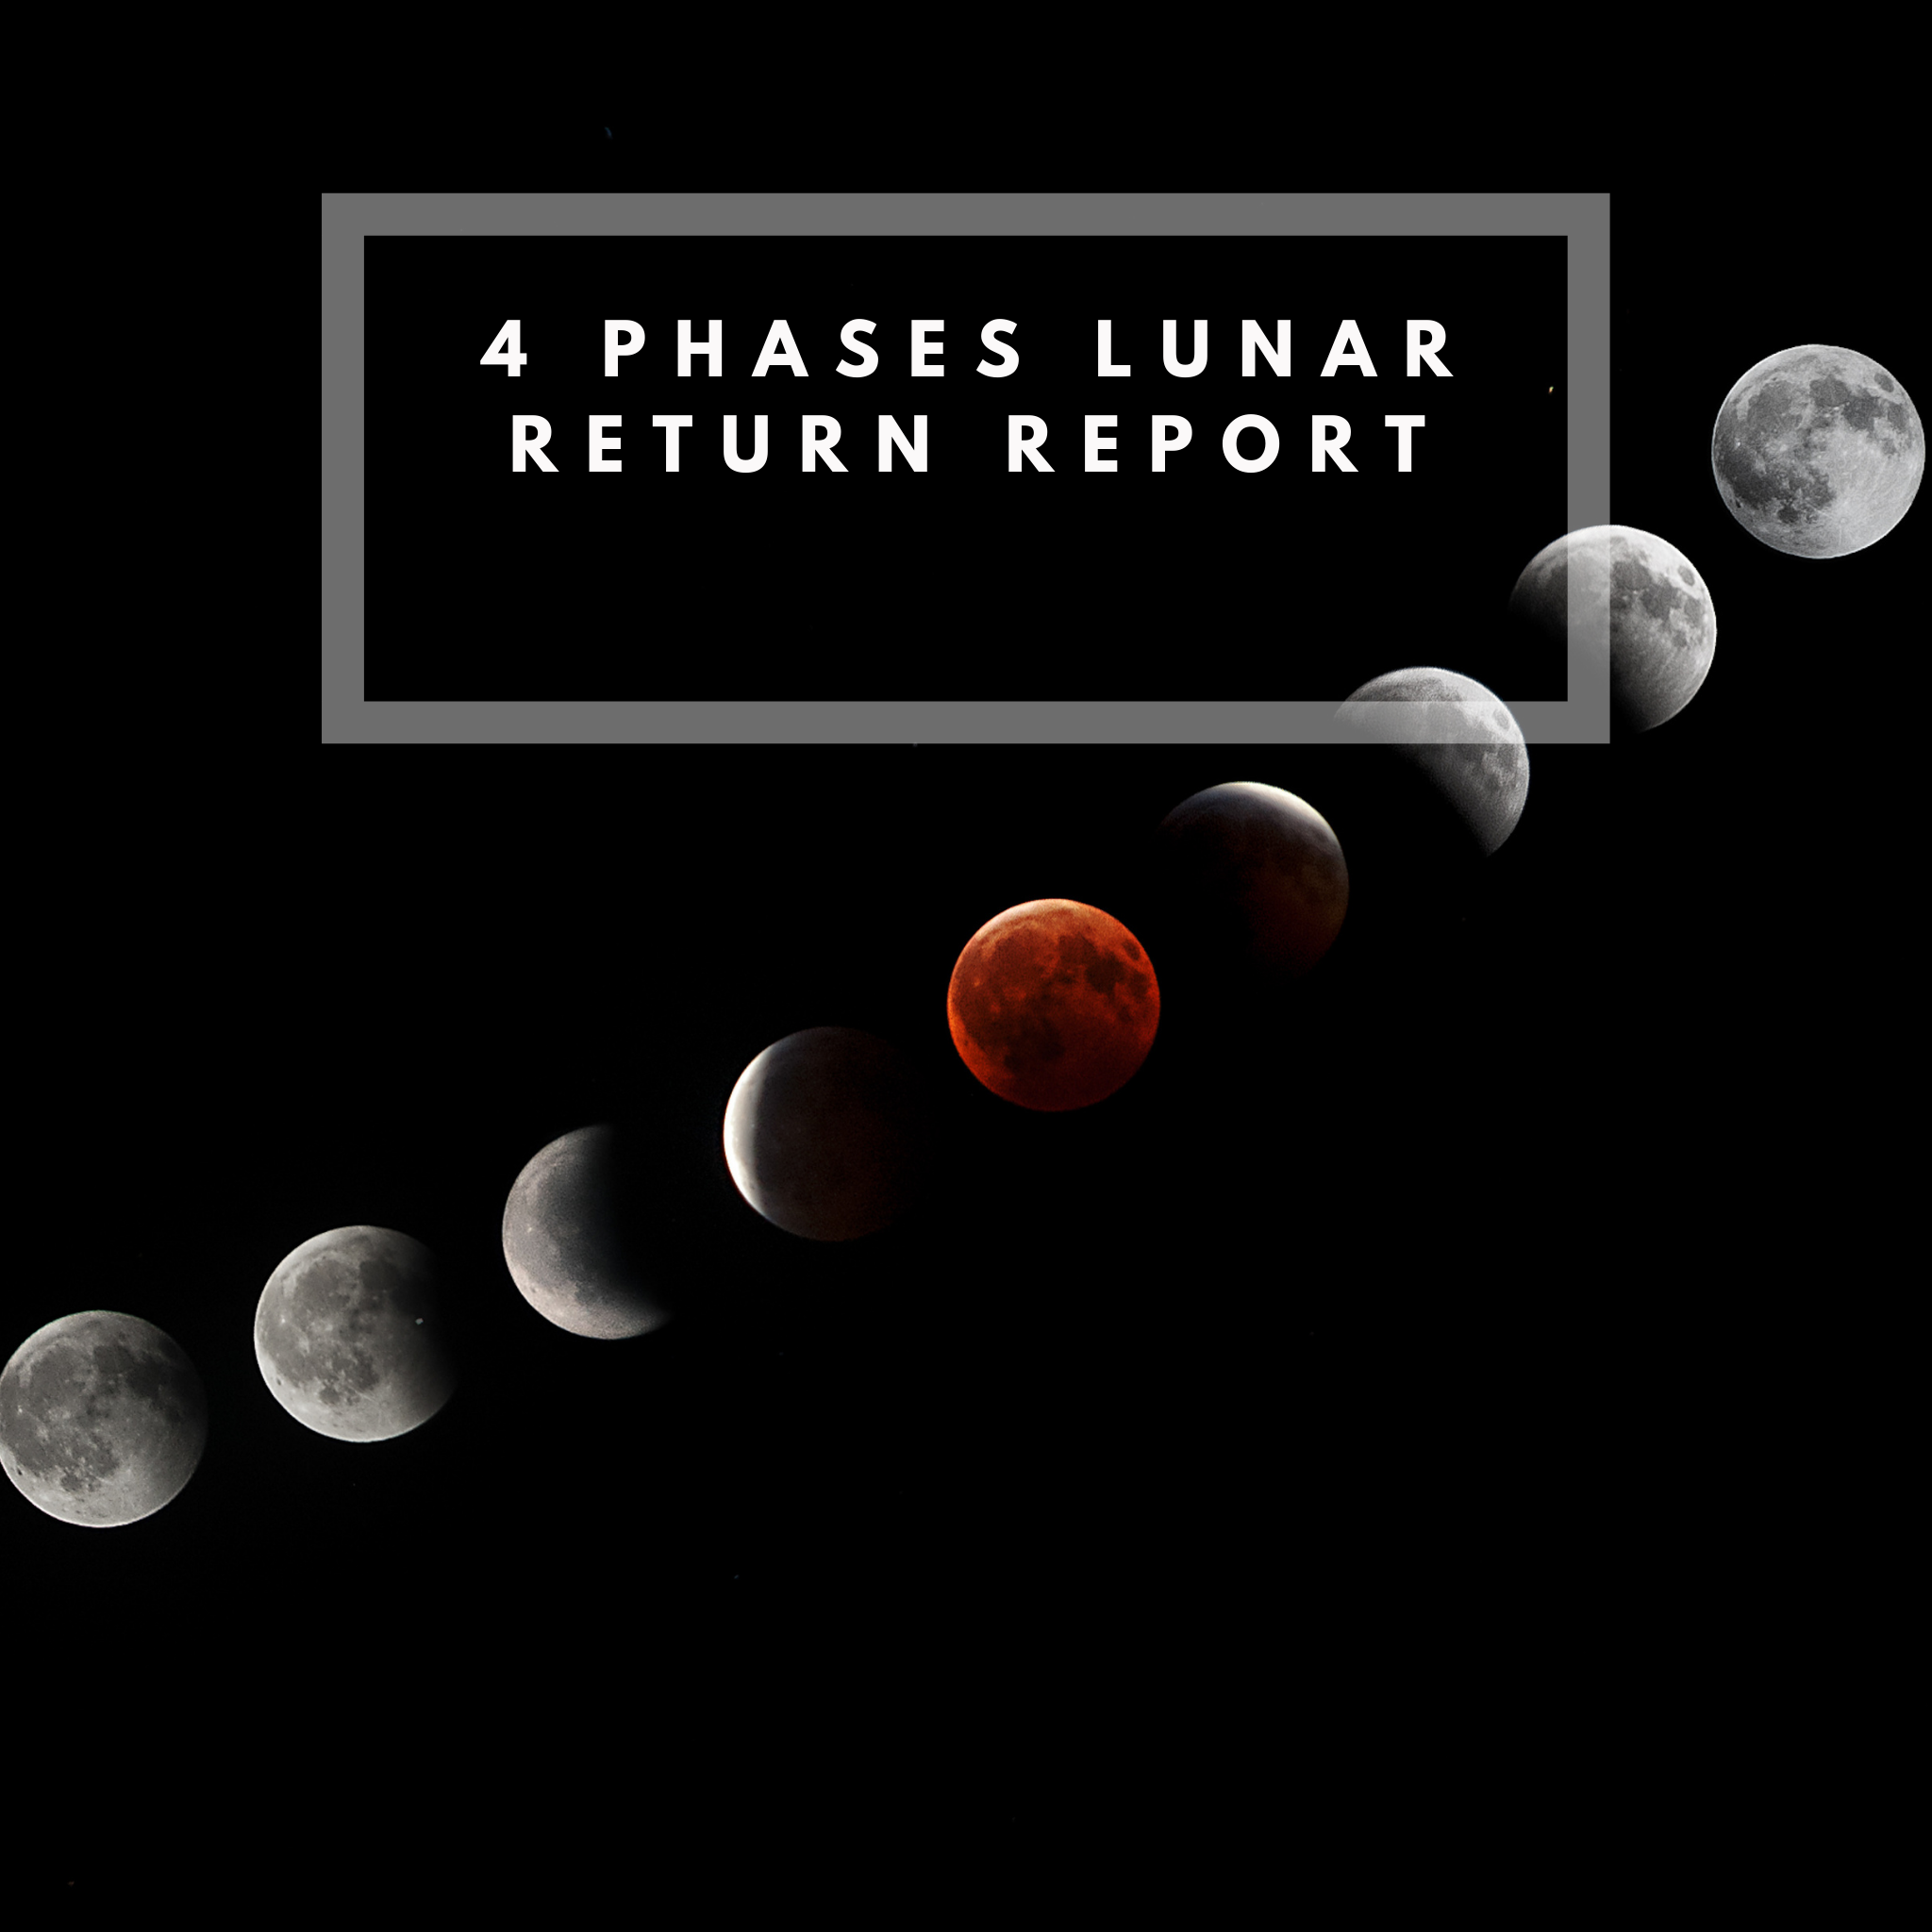 4 Phases Lunar Return Report